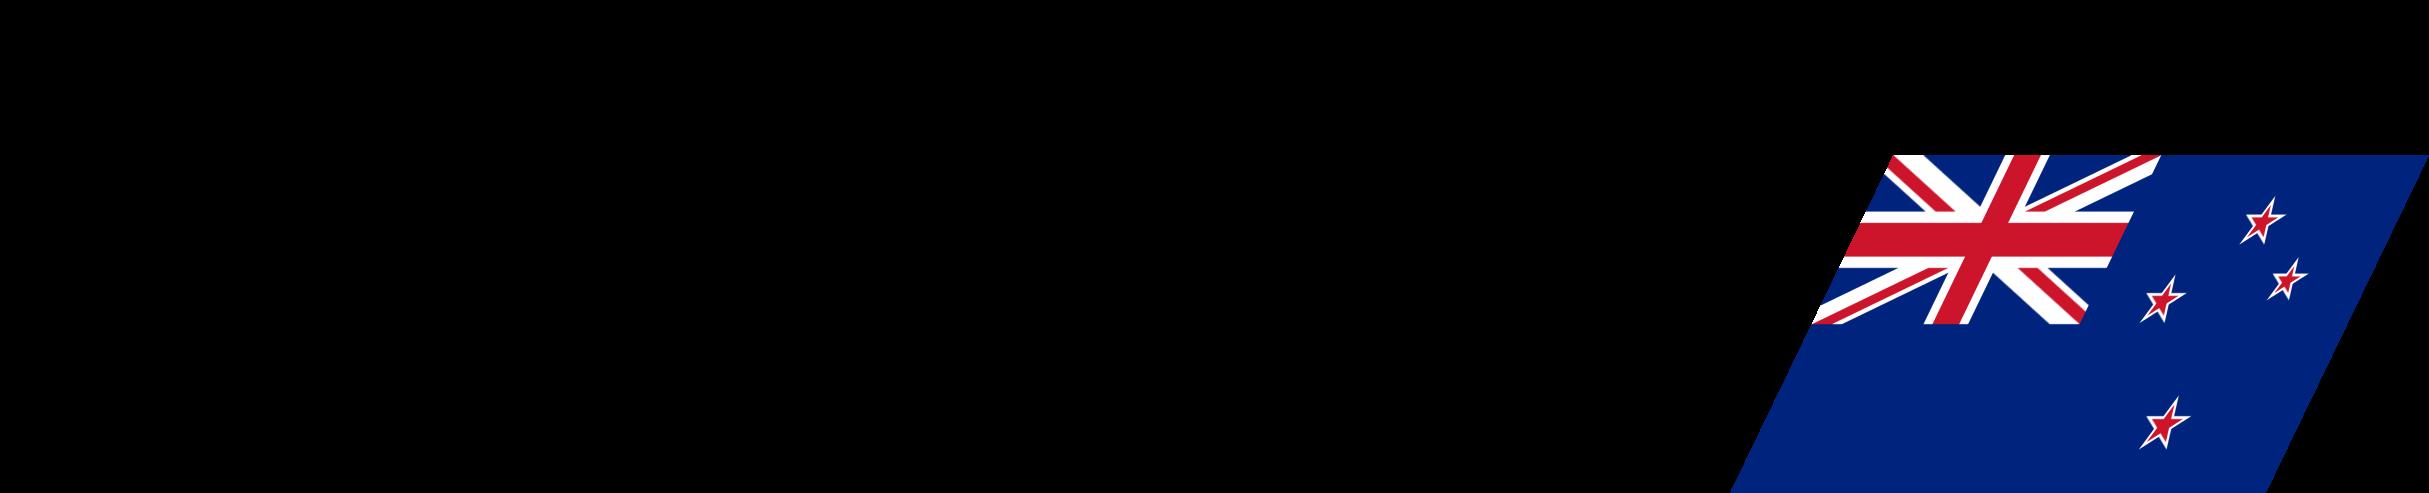 Reflex brand logo